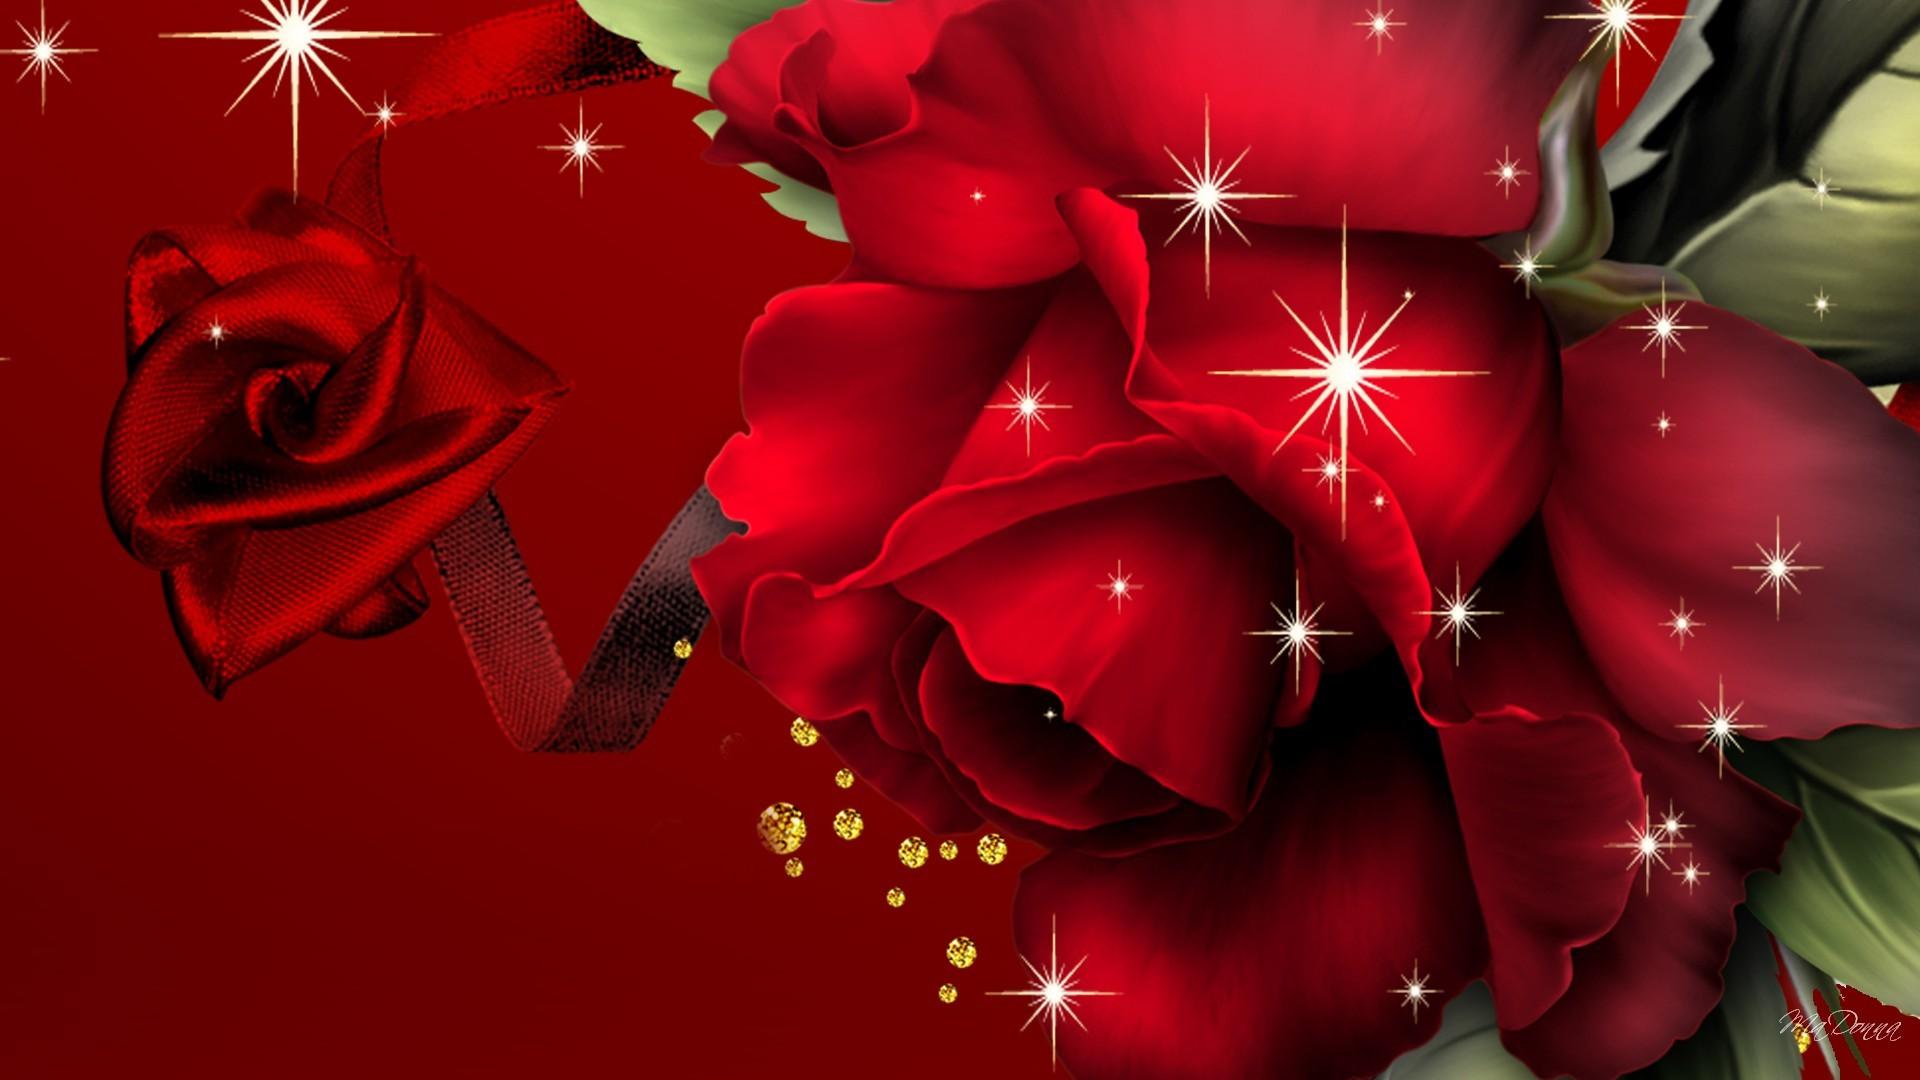 Red Roses Wallpapers for Desktop ·① WallpaperTag